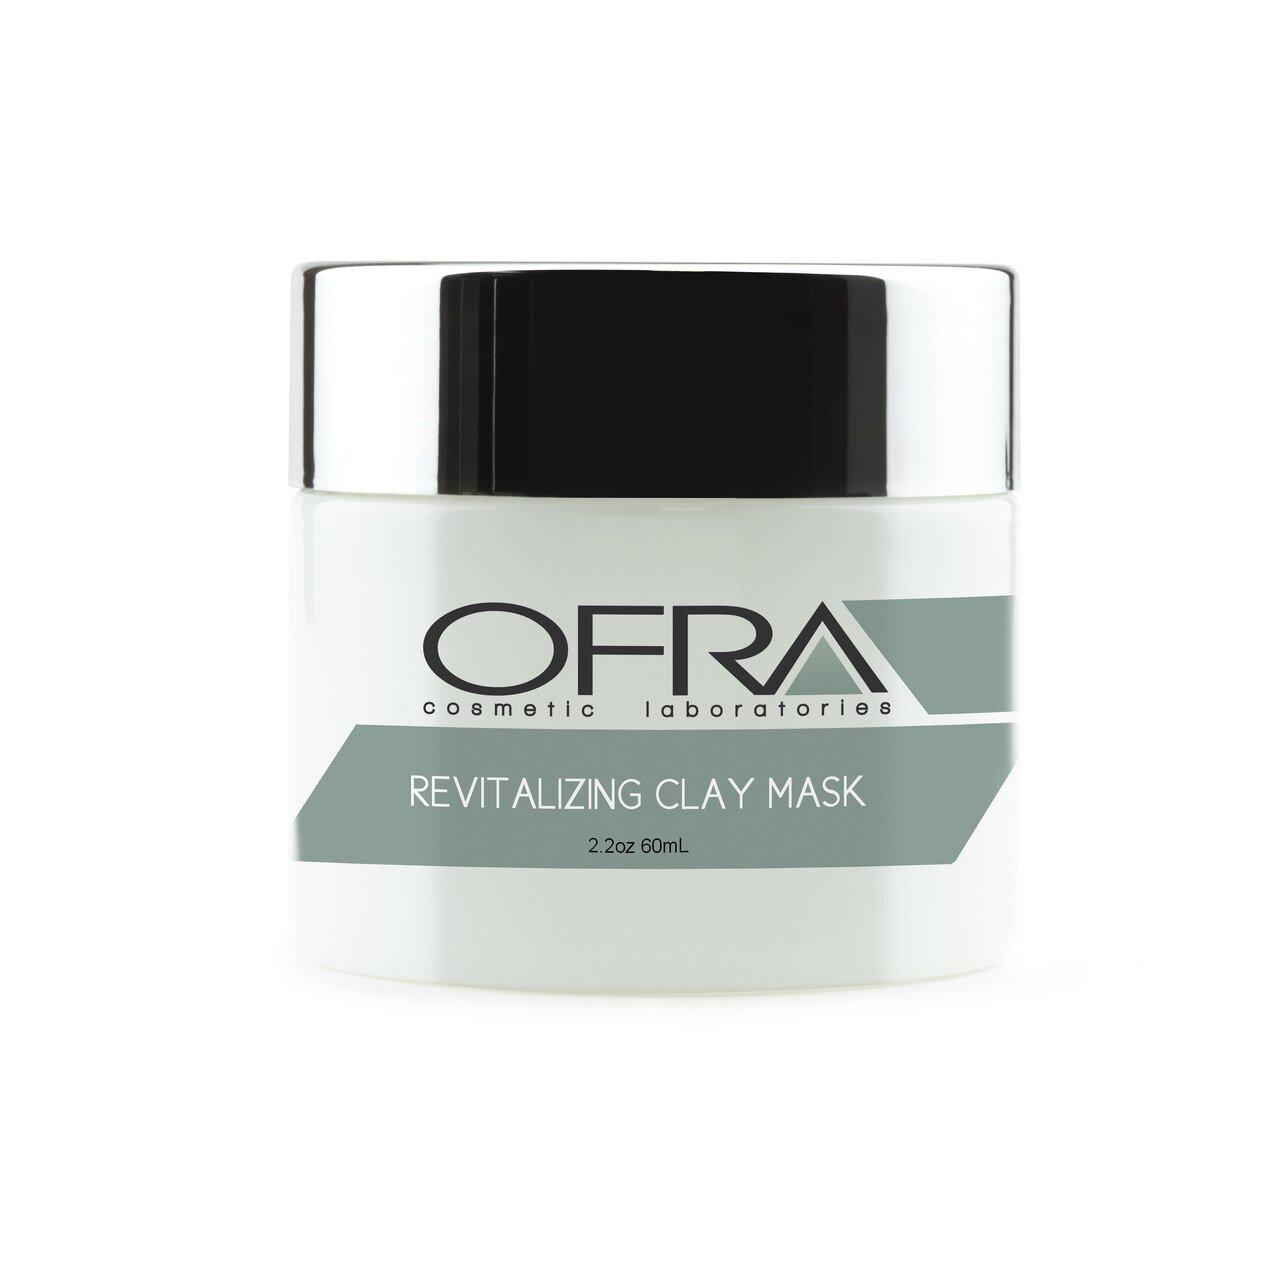 Revitalizing Clay Mask